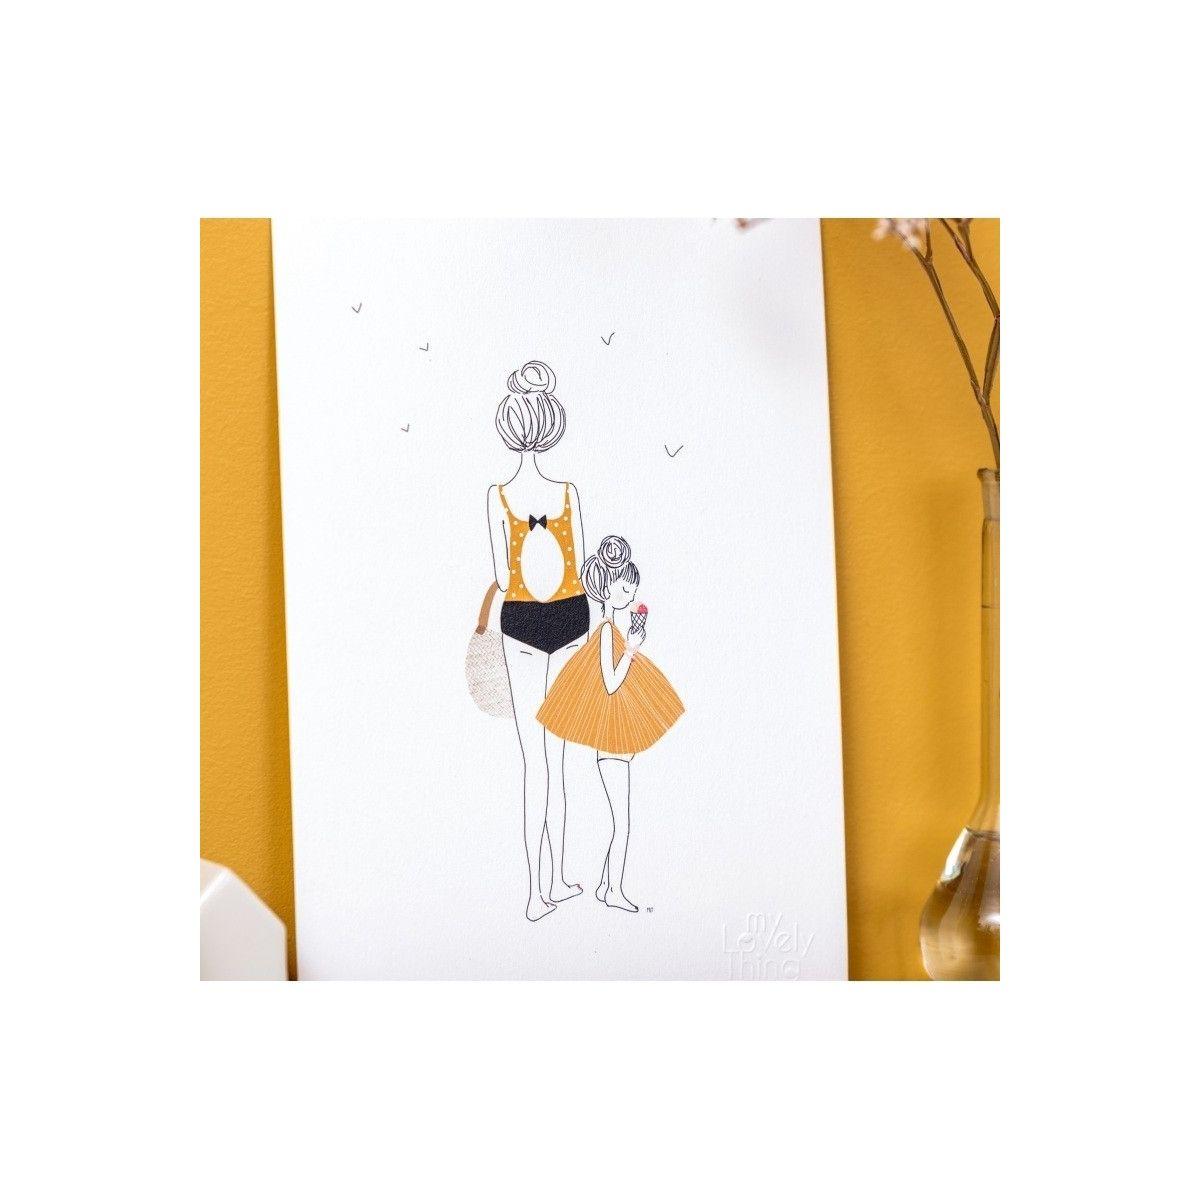 Plakat Stroll Mum and Girl - My Lovely Thing